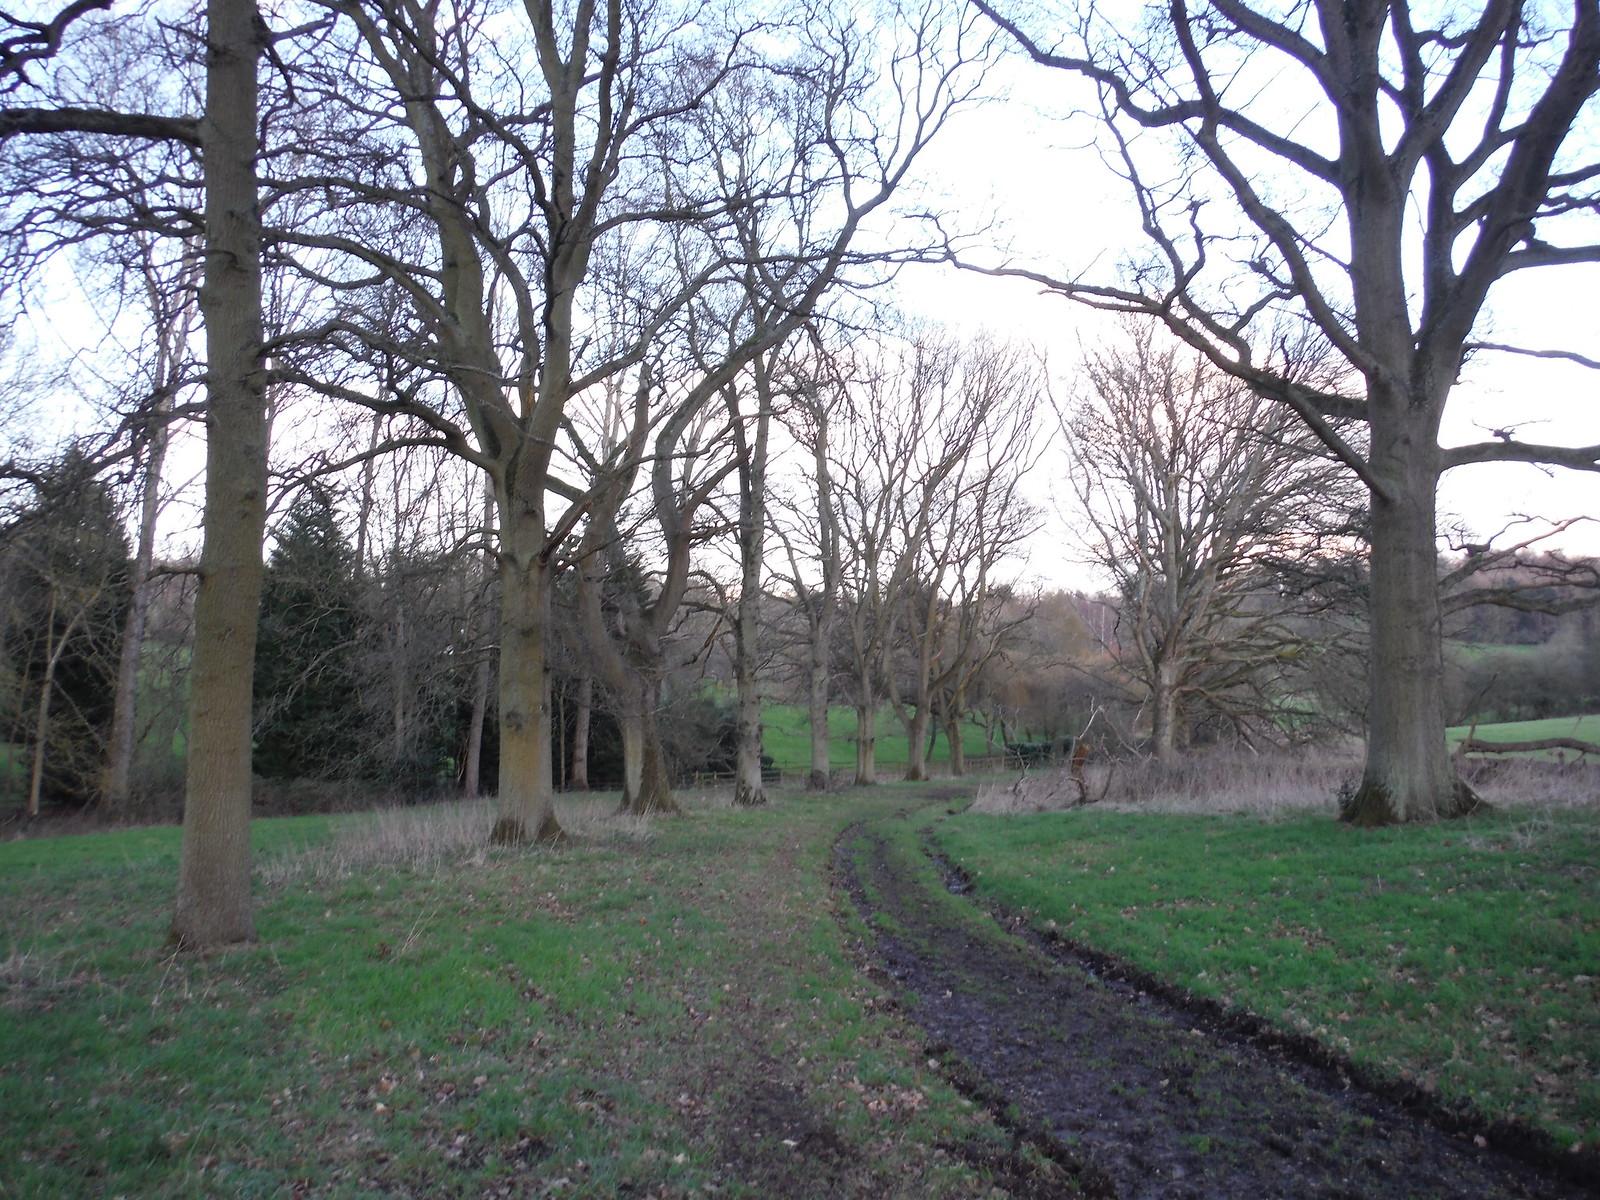 Tree-lined track, Midgham Park SWC Walk 117 Aldermaston to Woolhampton (via Stanford Dingley)